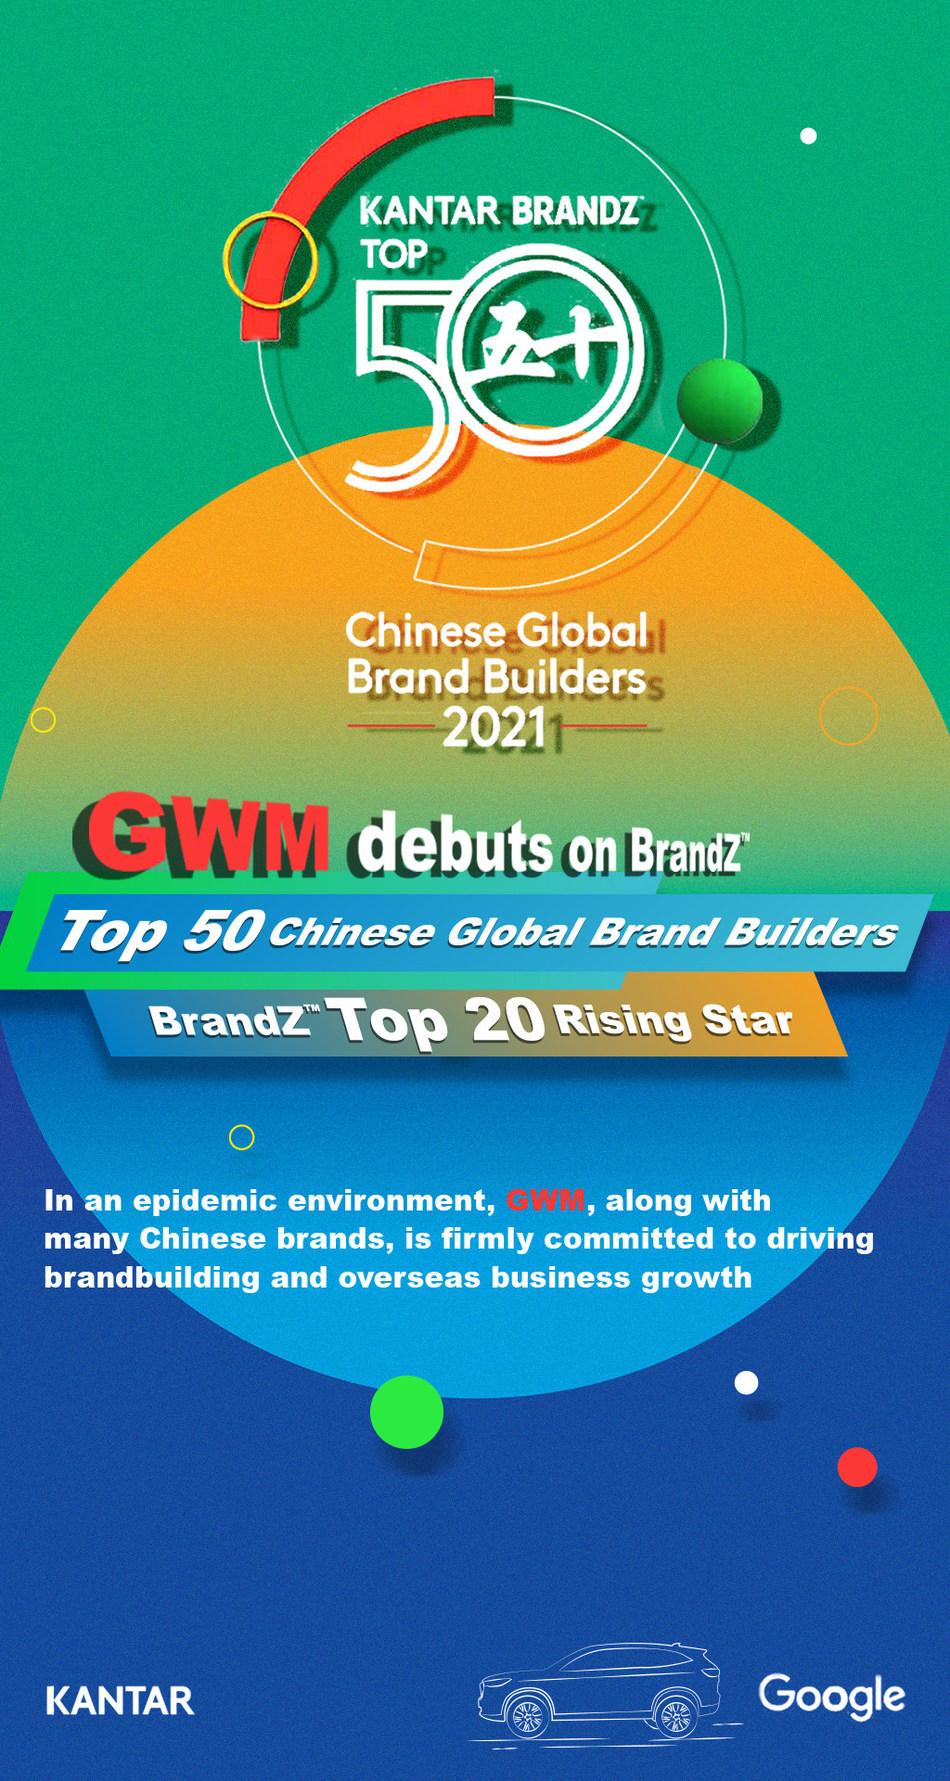 "GWM na lista da BrandZ™ ""Top 50 Chinese Global Brand Builders"" pela primeira vez em 2021 (PRNewsfoto/GWM)"